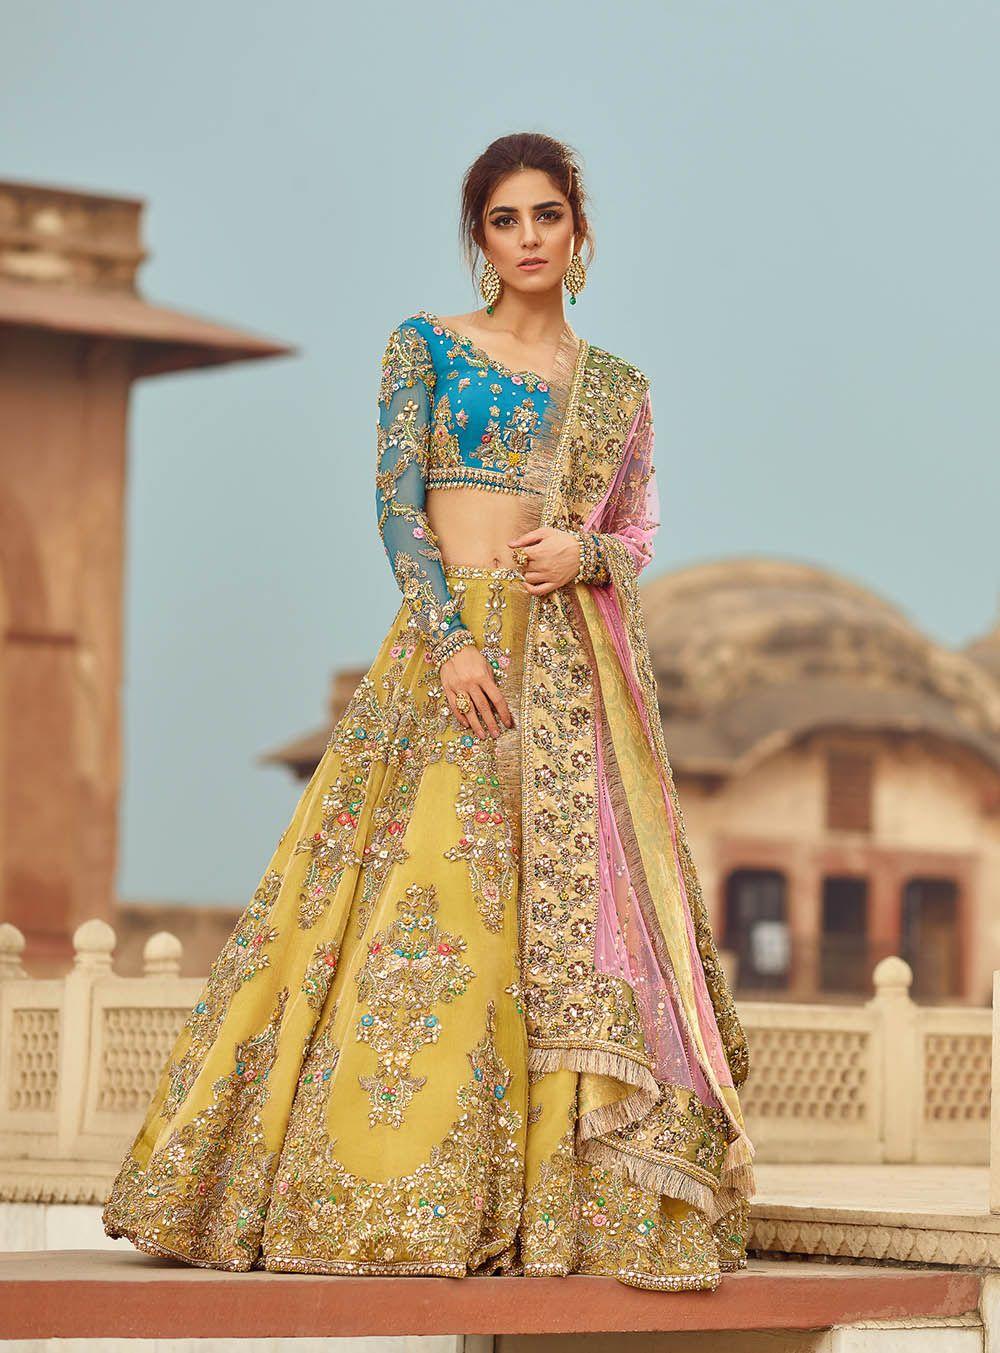 Mehndi Outfits For Brides 2020 By Pakistani Designers Latest Bridal Dresses Pakistani Mehndi Dress Bridal Mehndi Dresses